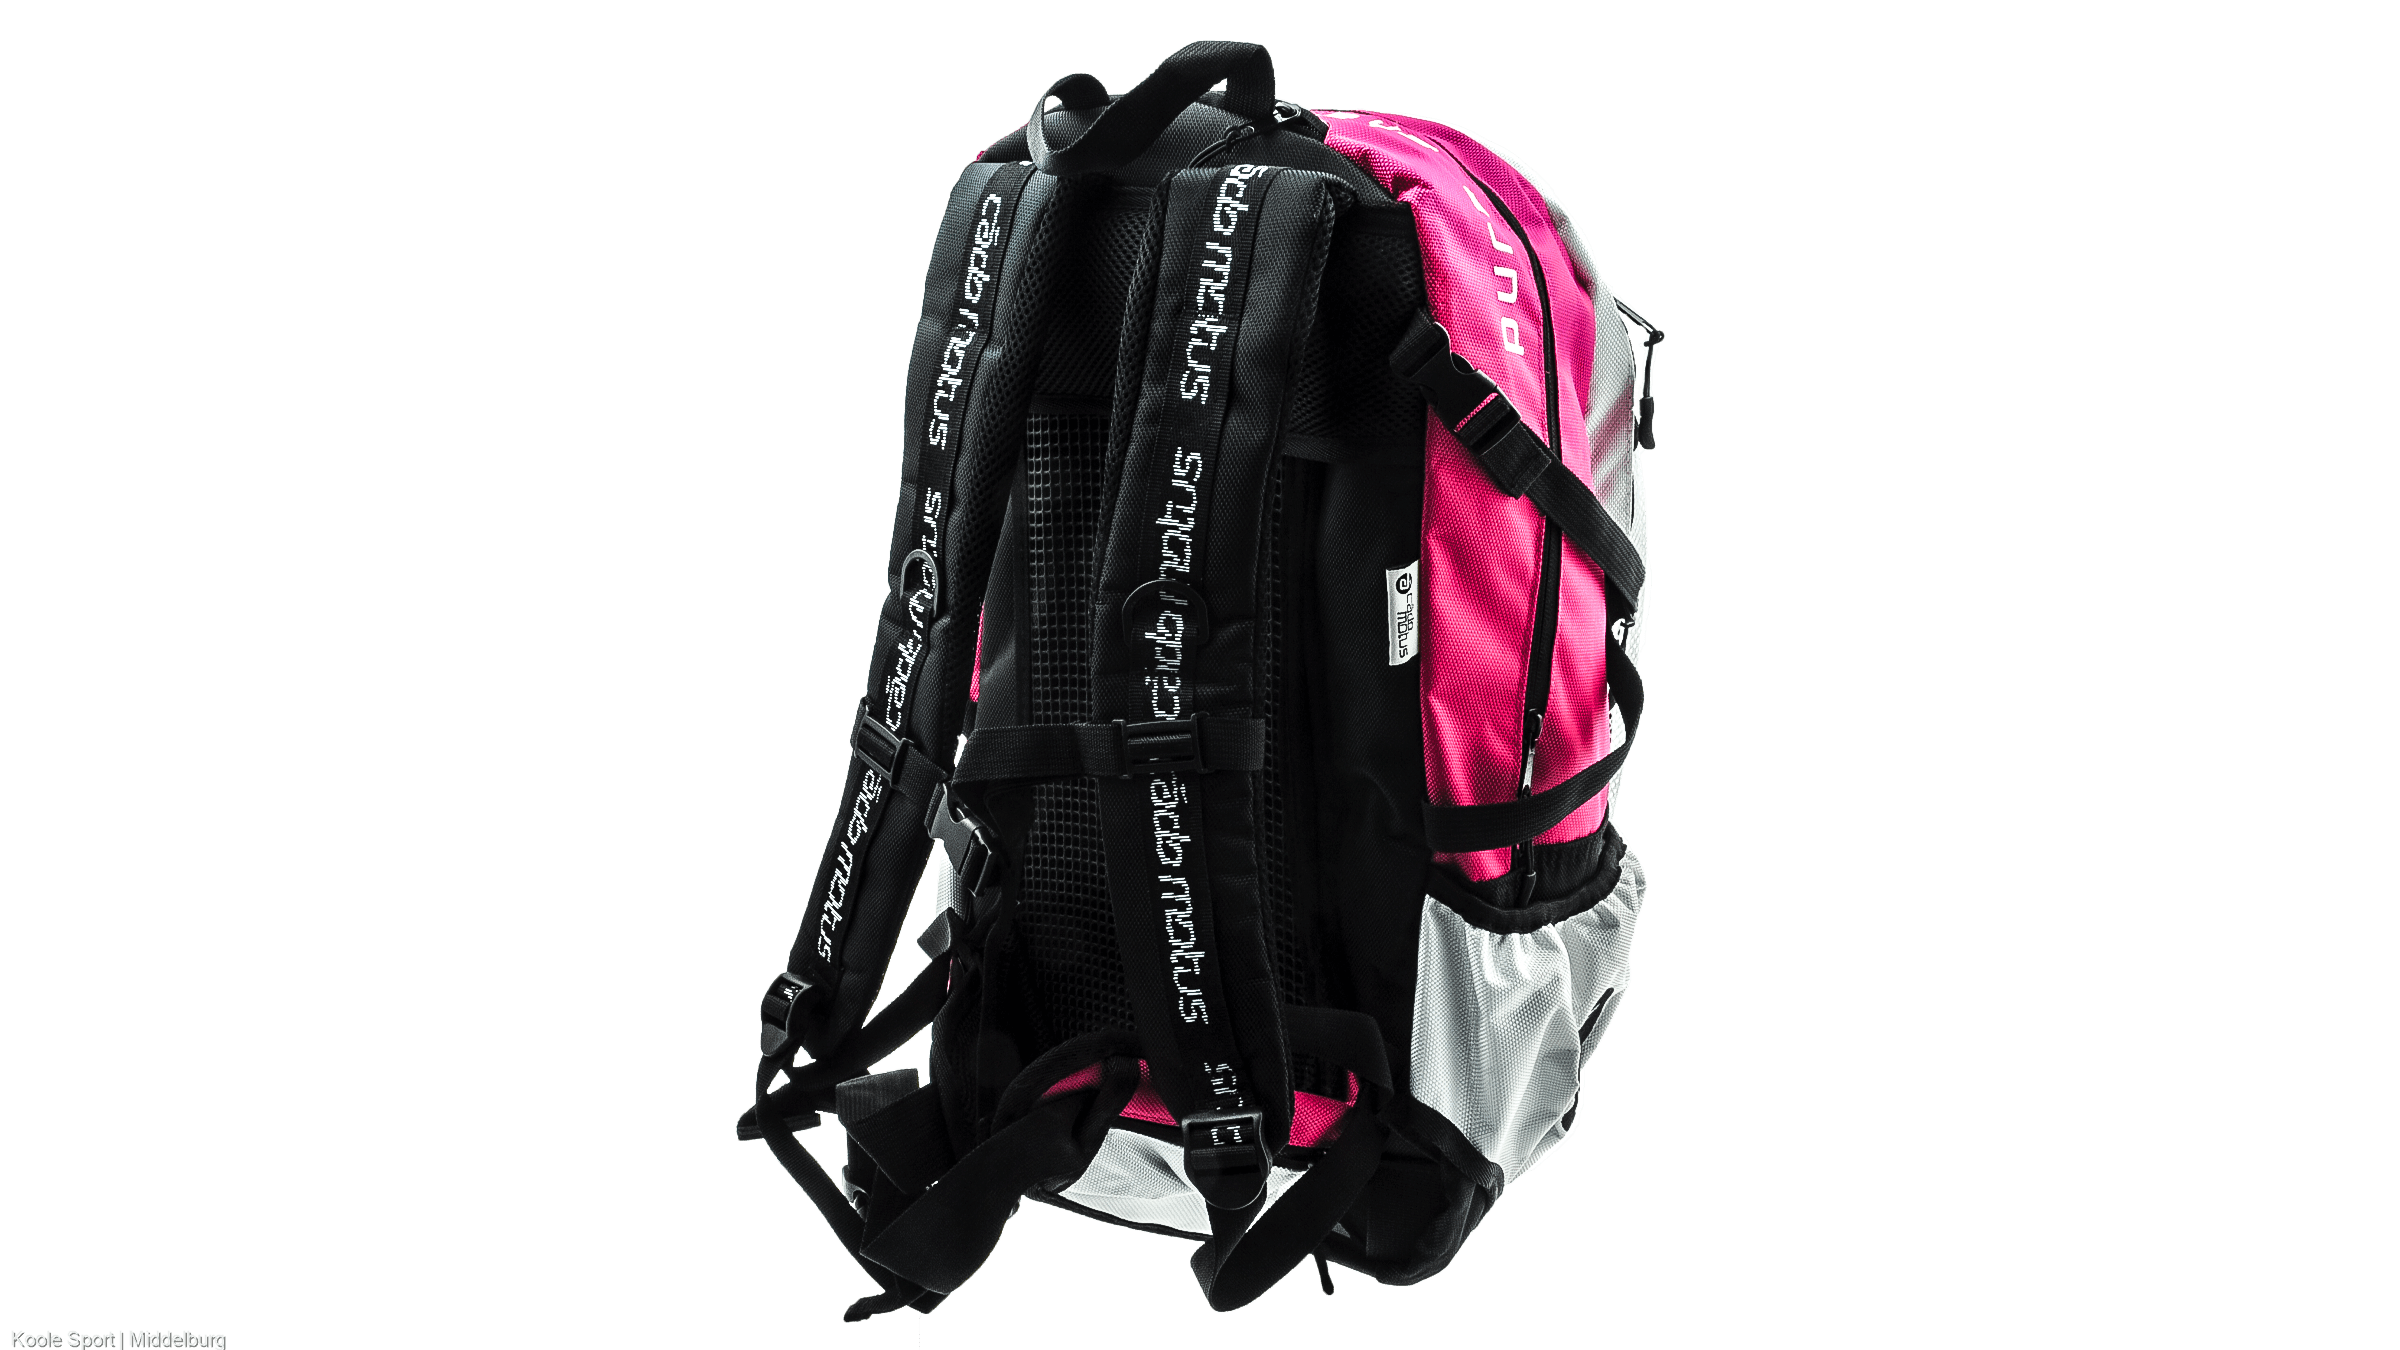 41f2764fe6a CadoMotus Airflow gear skate skeeler bag - pink/white [model 2016 ...